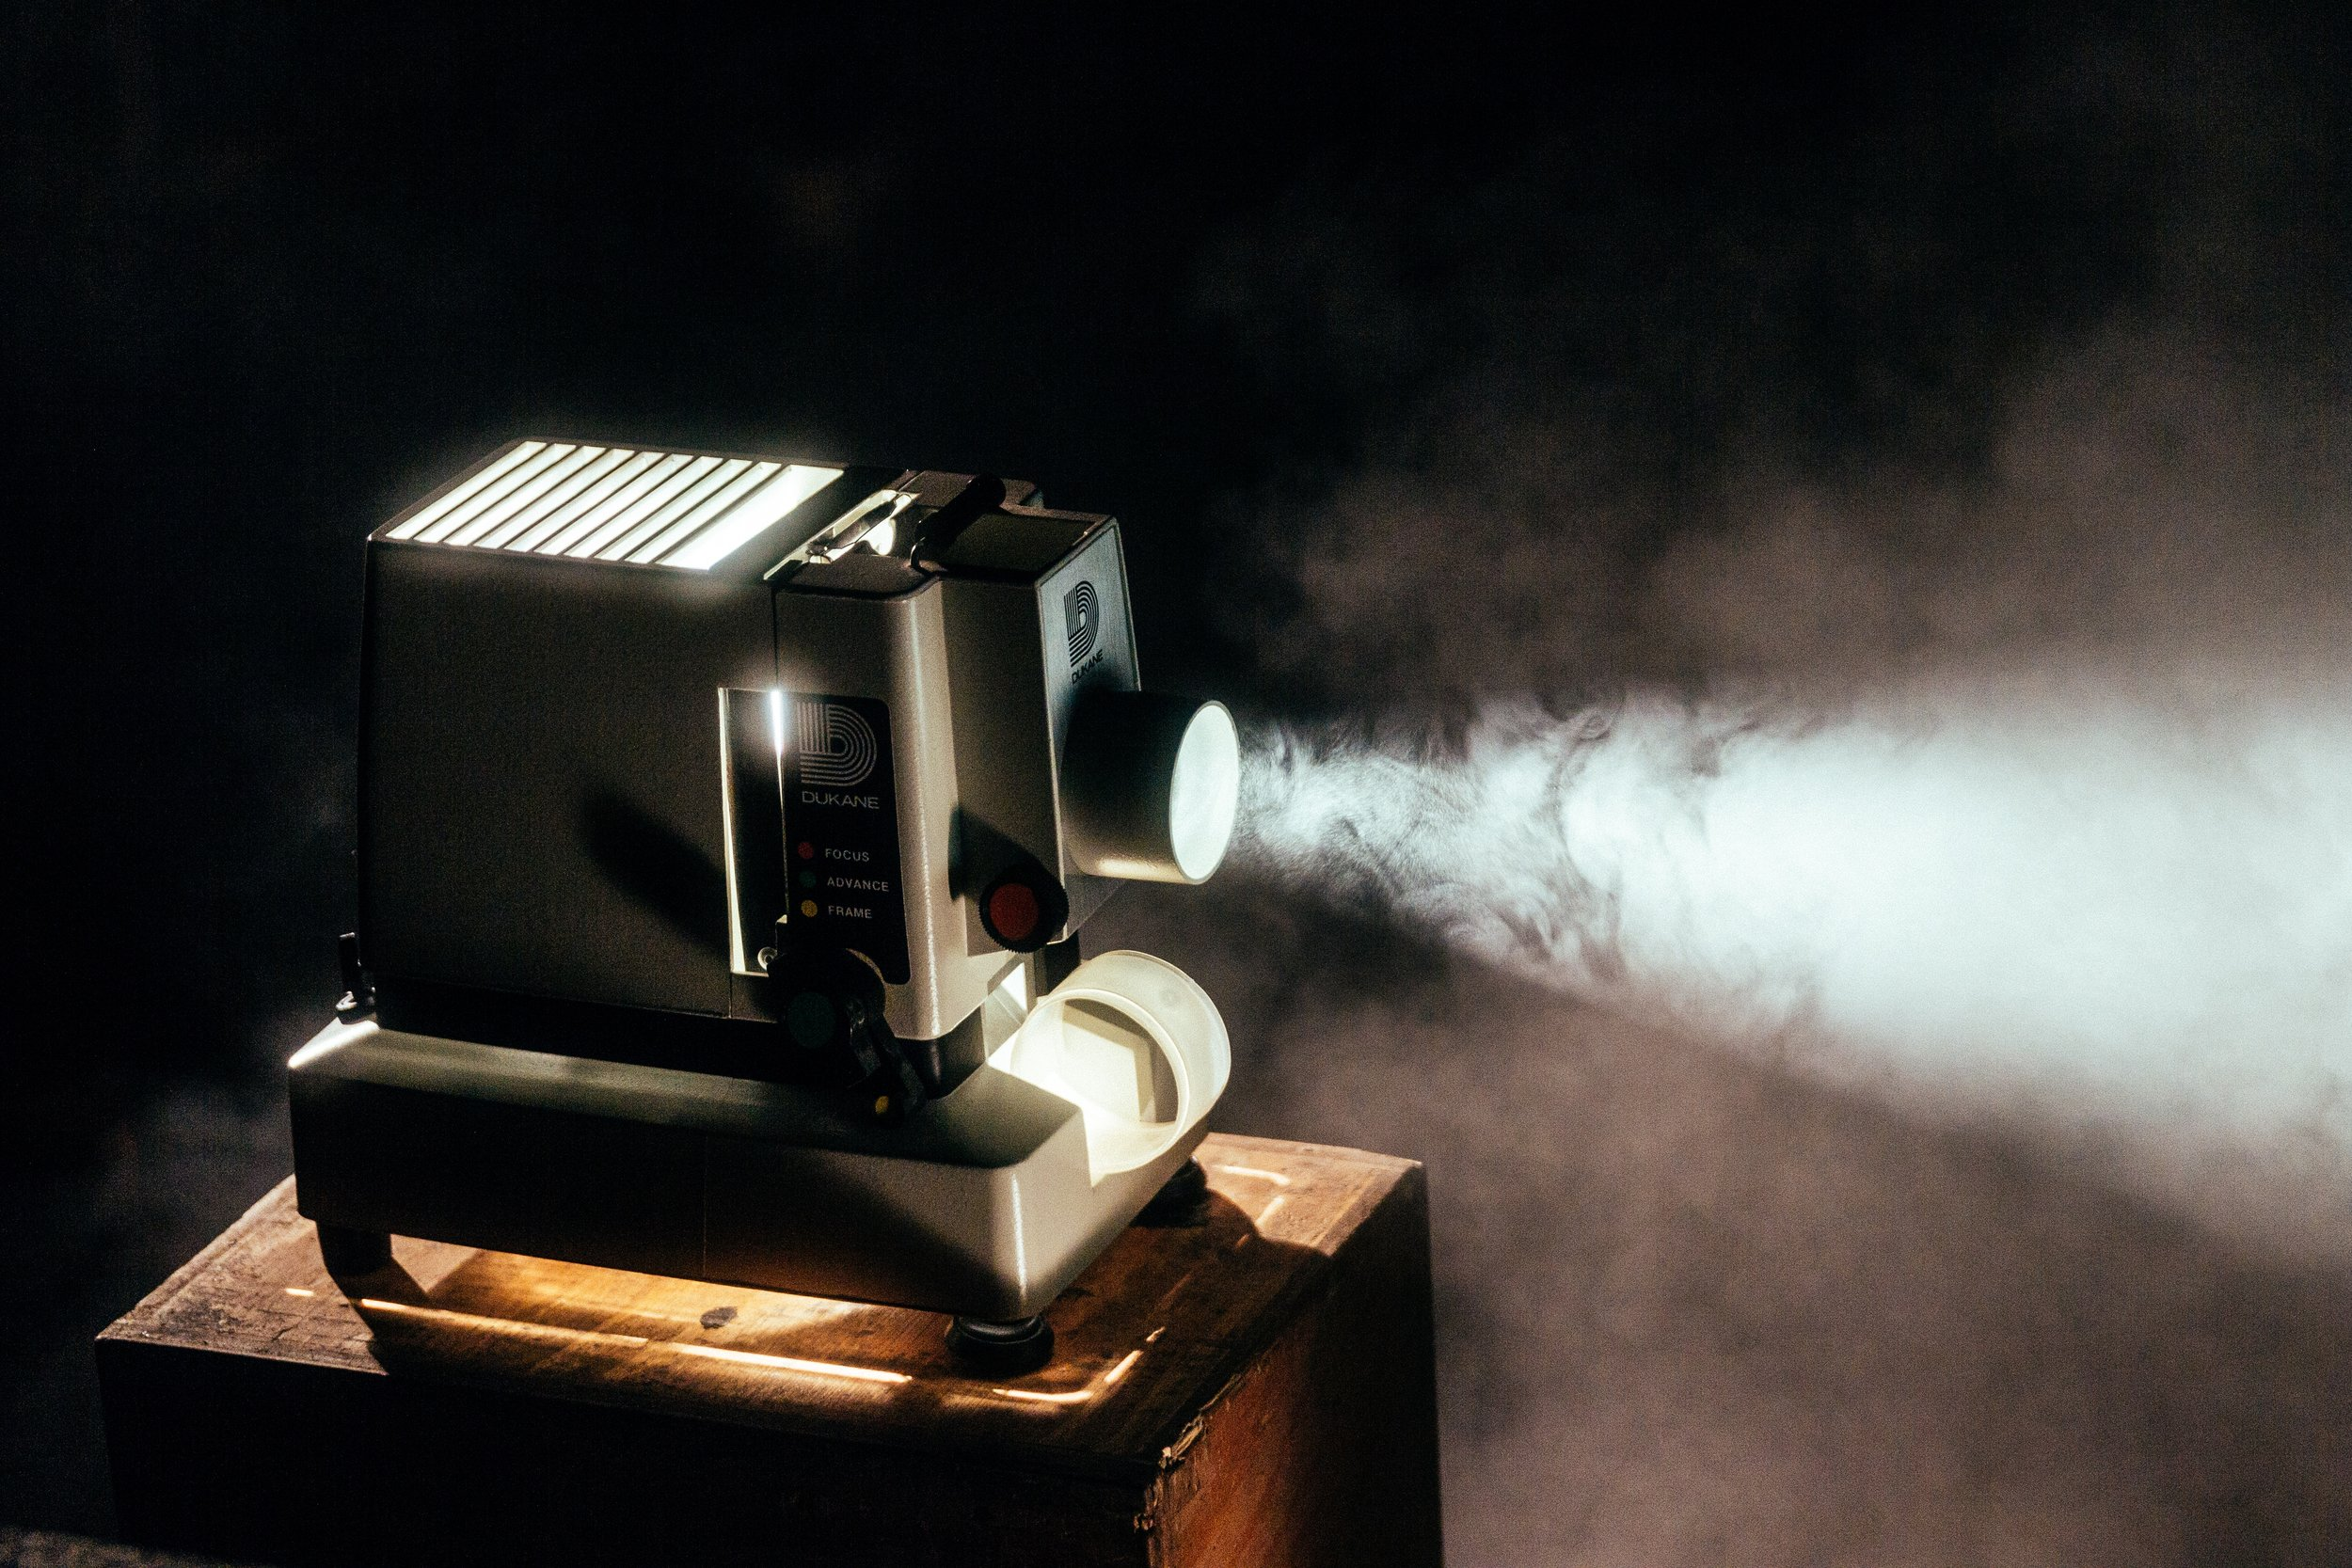 projector-unsplash.jpg